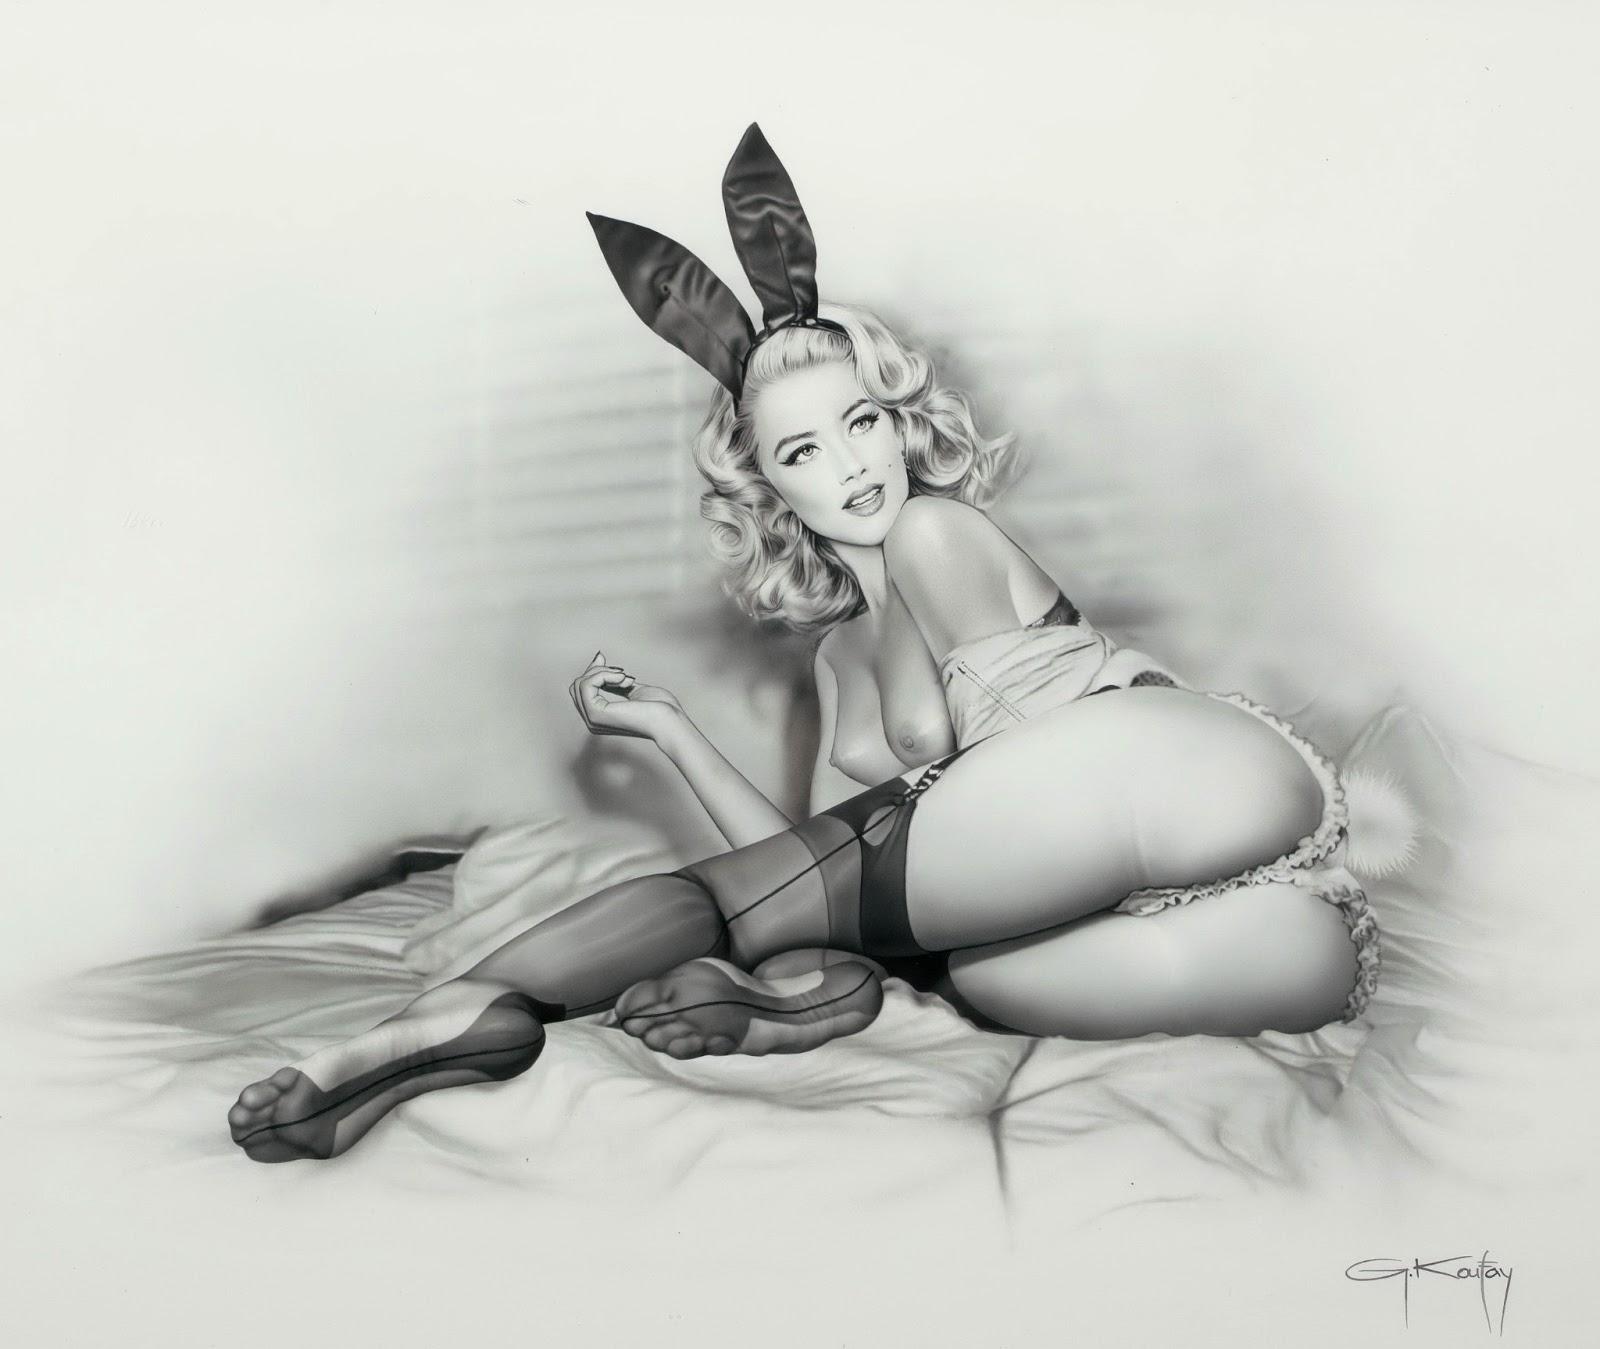 mastera-eroticheskogo-risunka